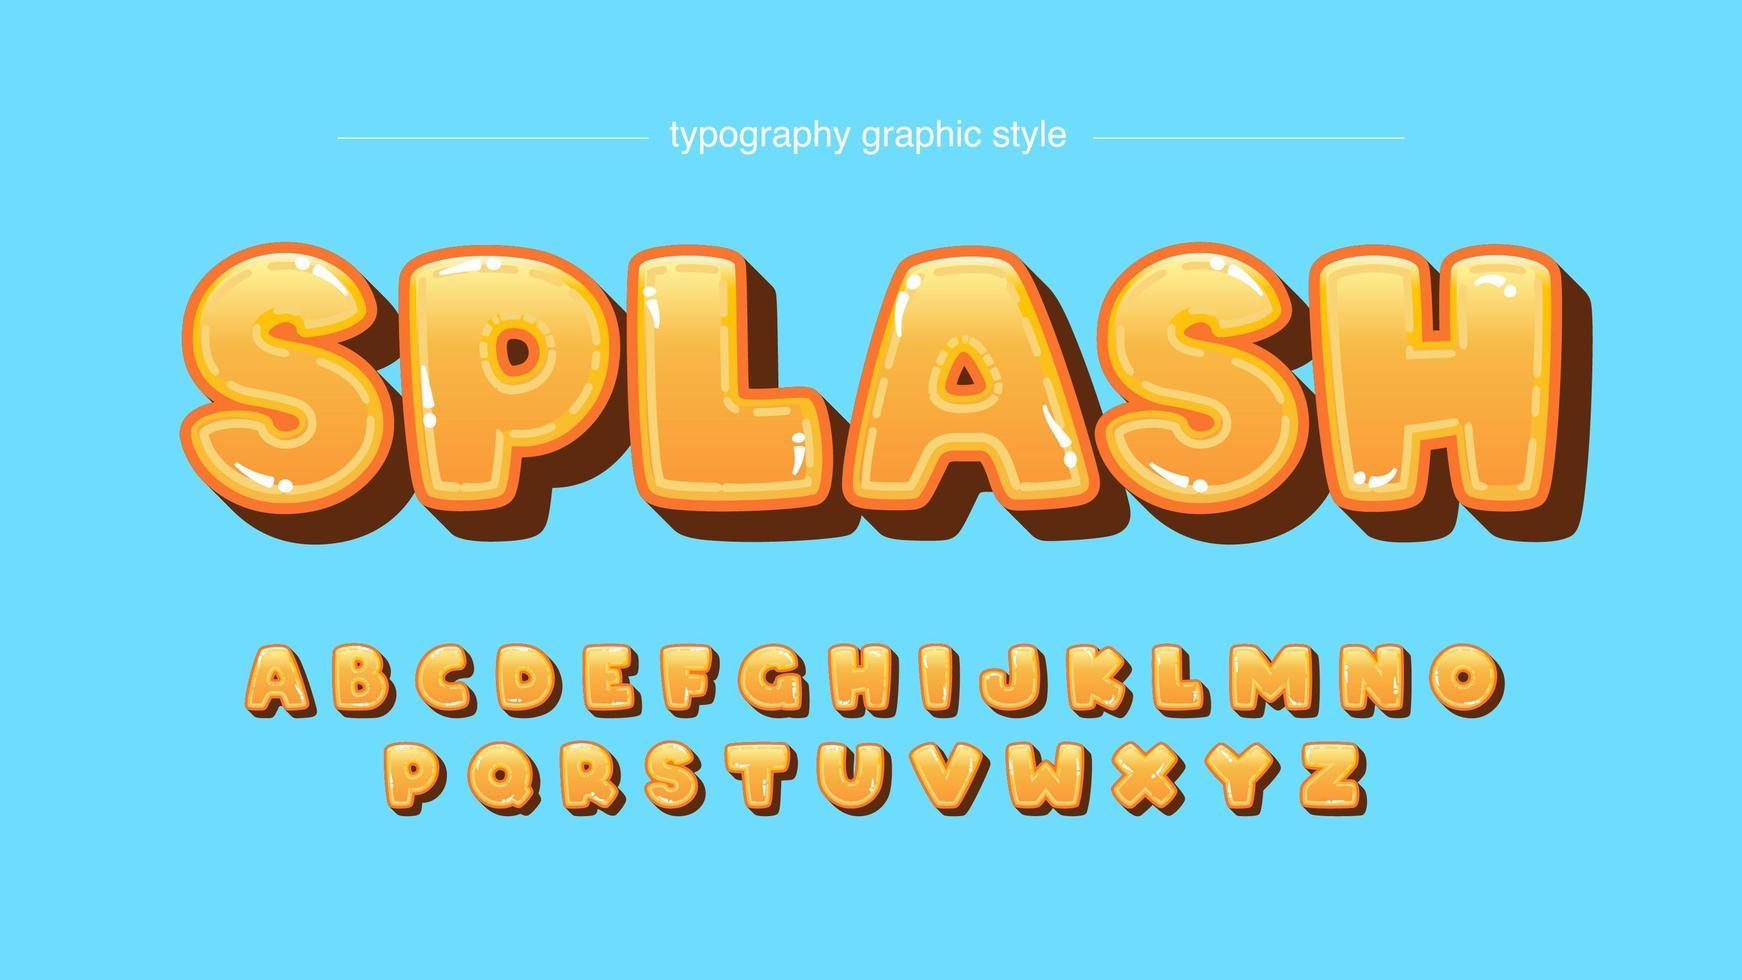 tipografía caricatura redondeada burbuja naranja brillante vector